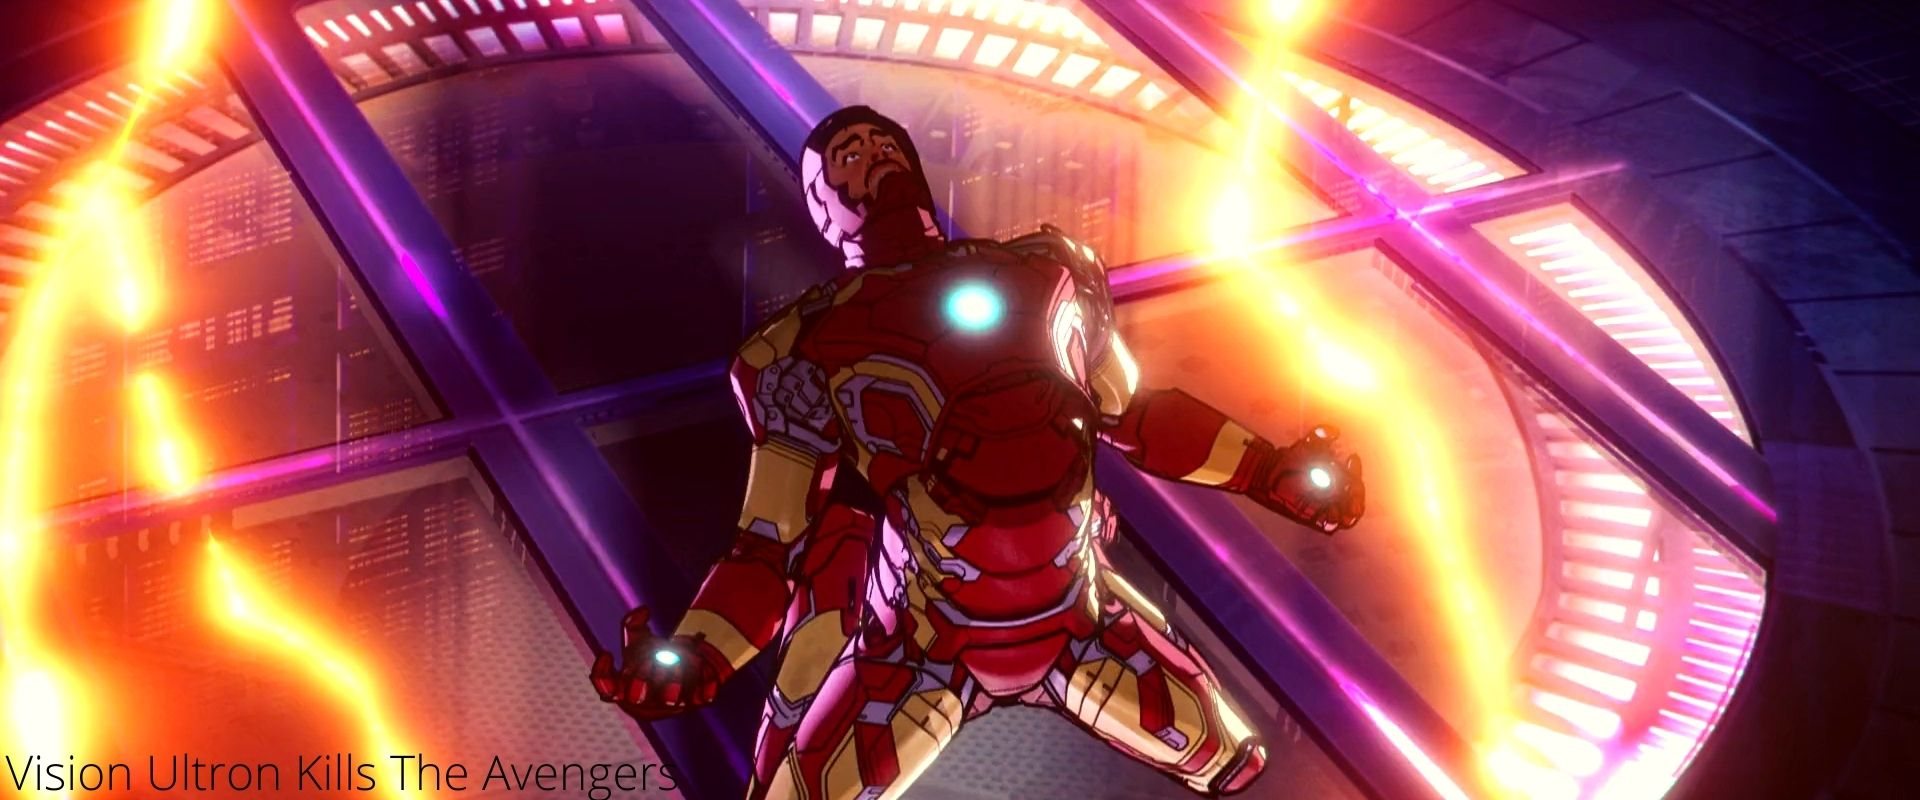 The Avengers vs Vision Ultron